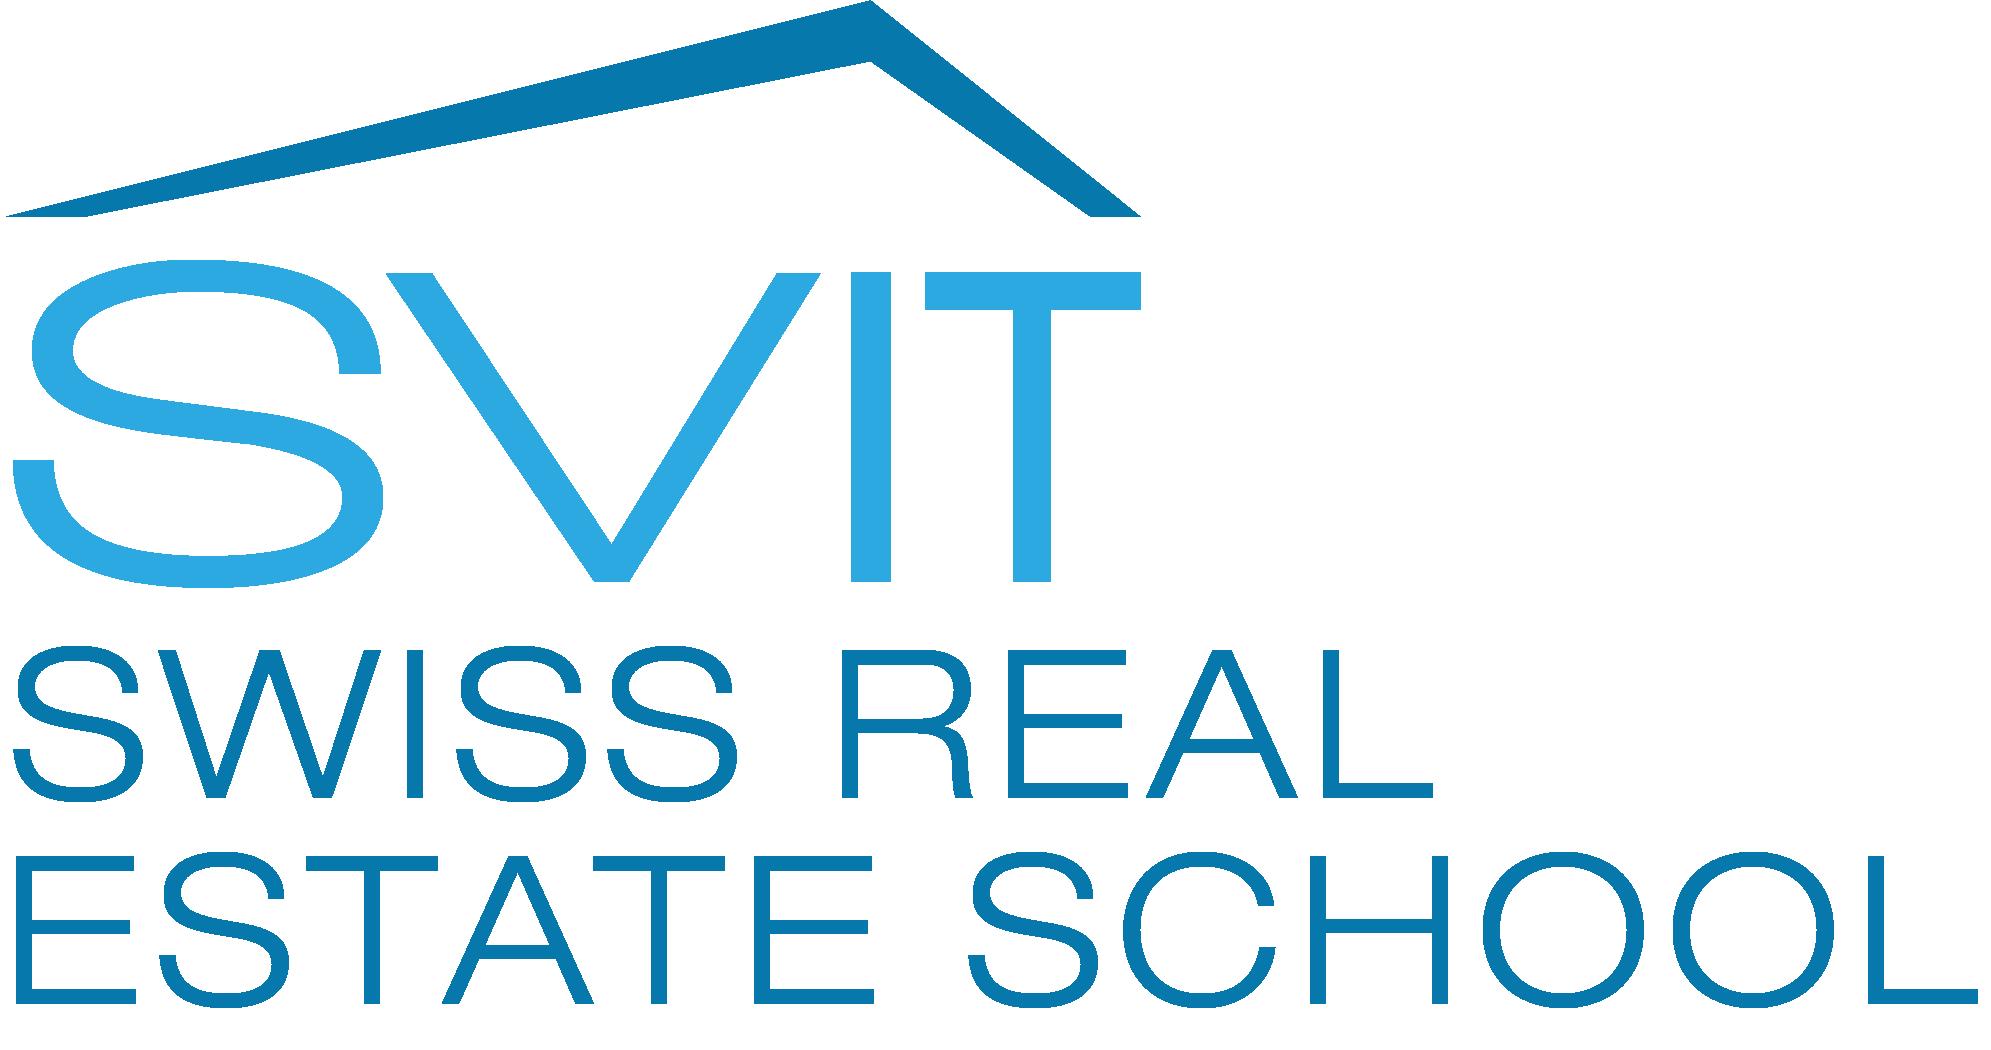 SVIT Swiss Real Estate School AG